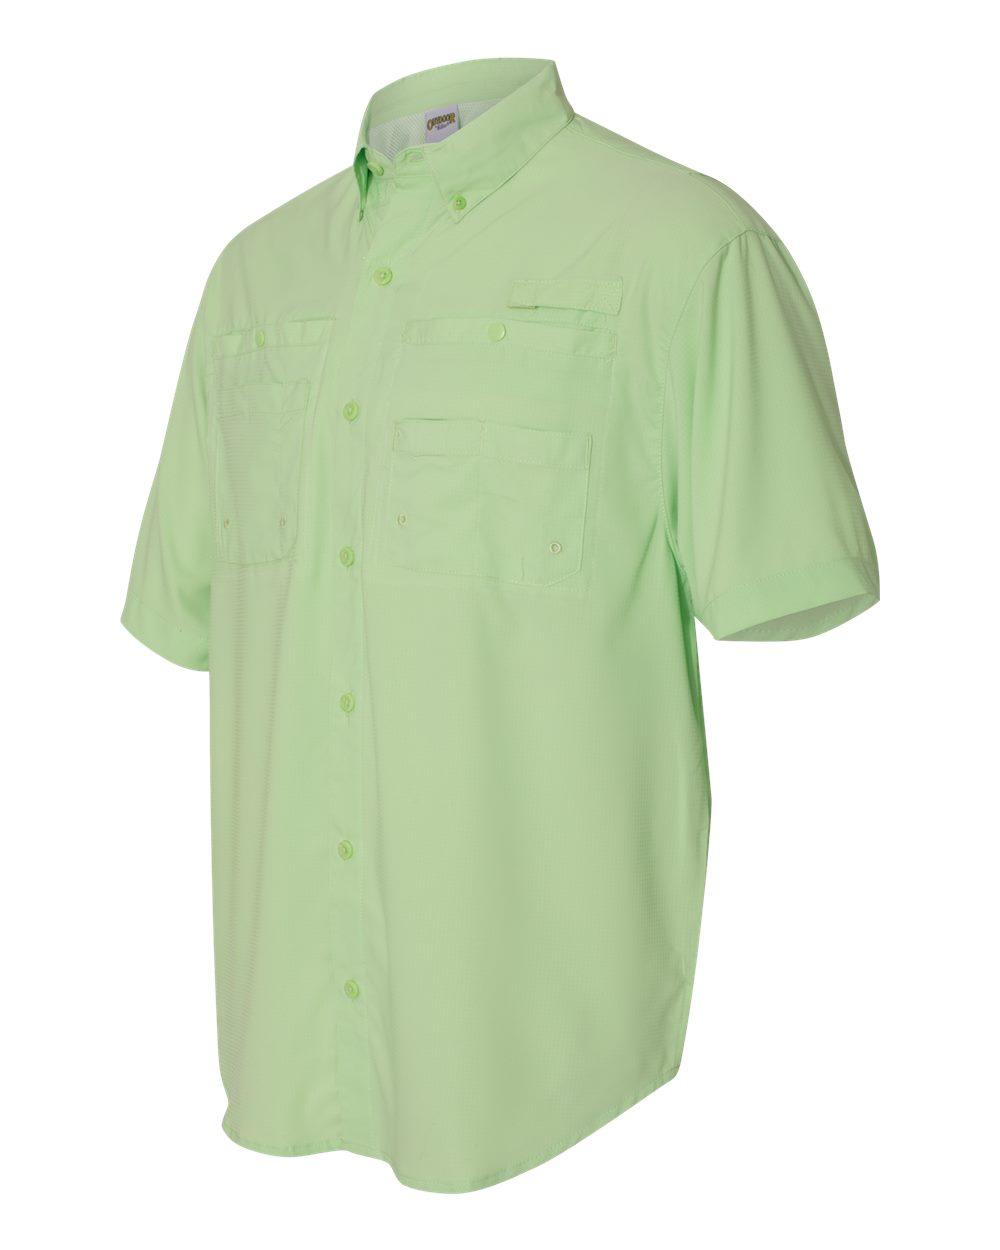 Hilton ZP2297 - Baja Short Sleeve Fishing Shirt